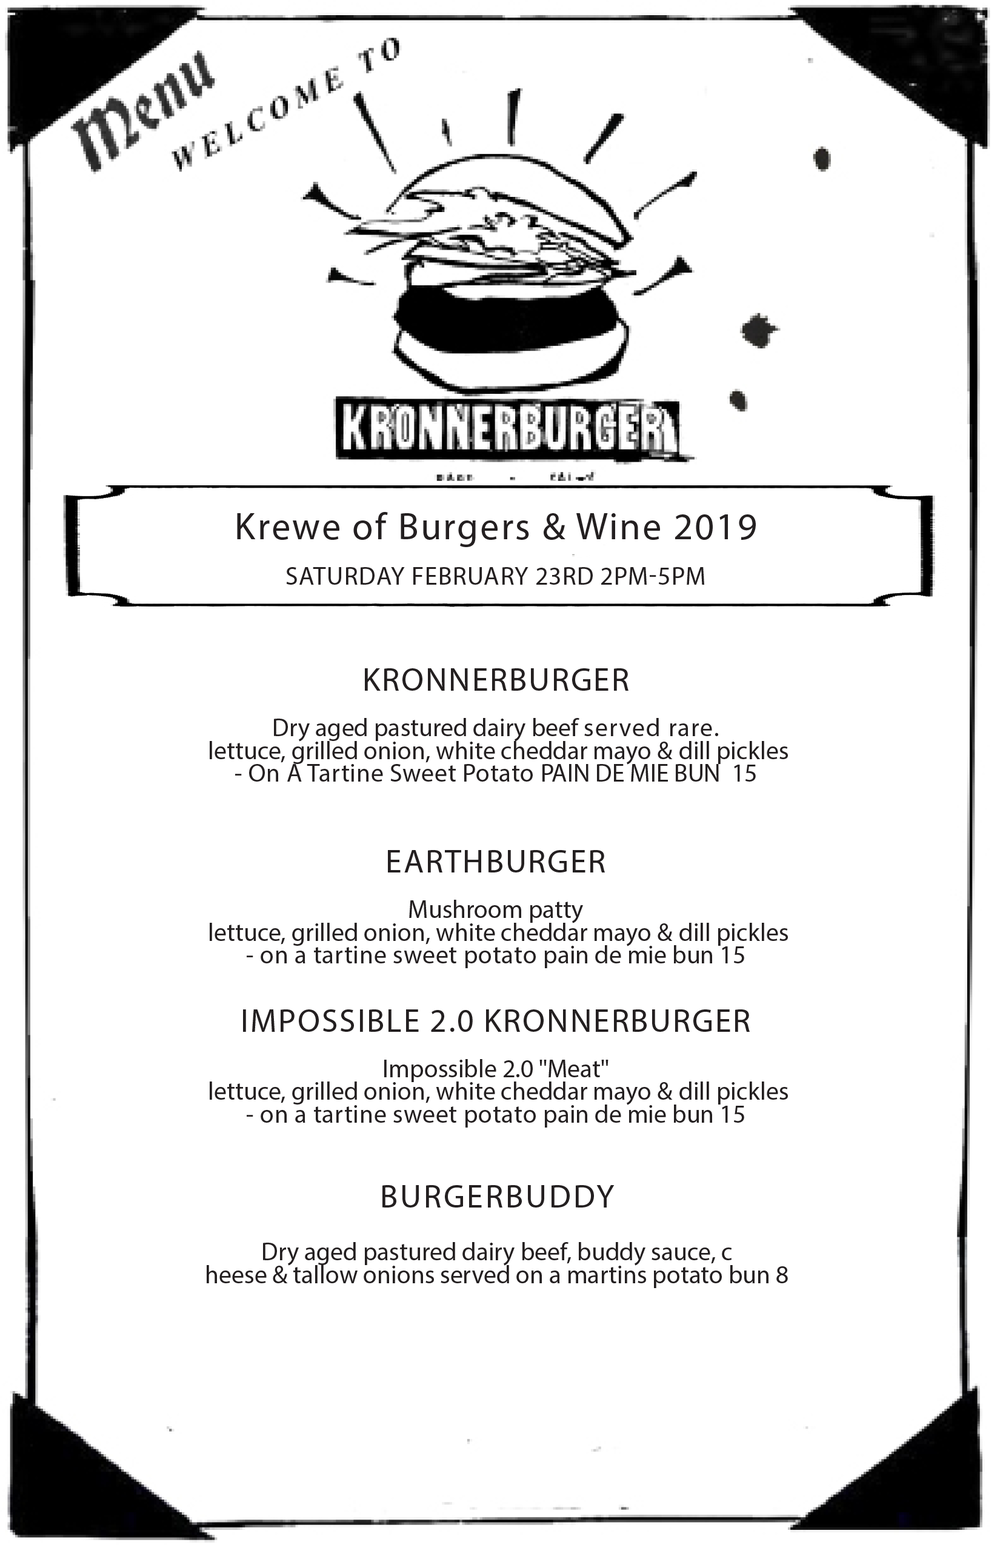 KronnerBurger Bacchanal Menu-1.png